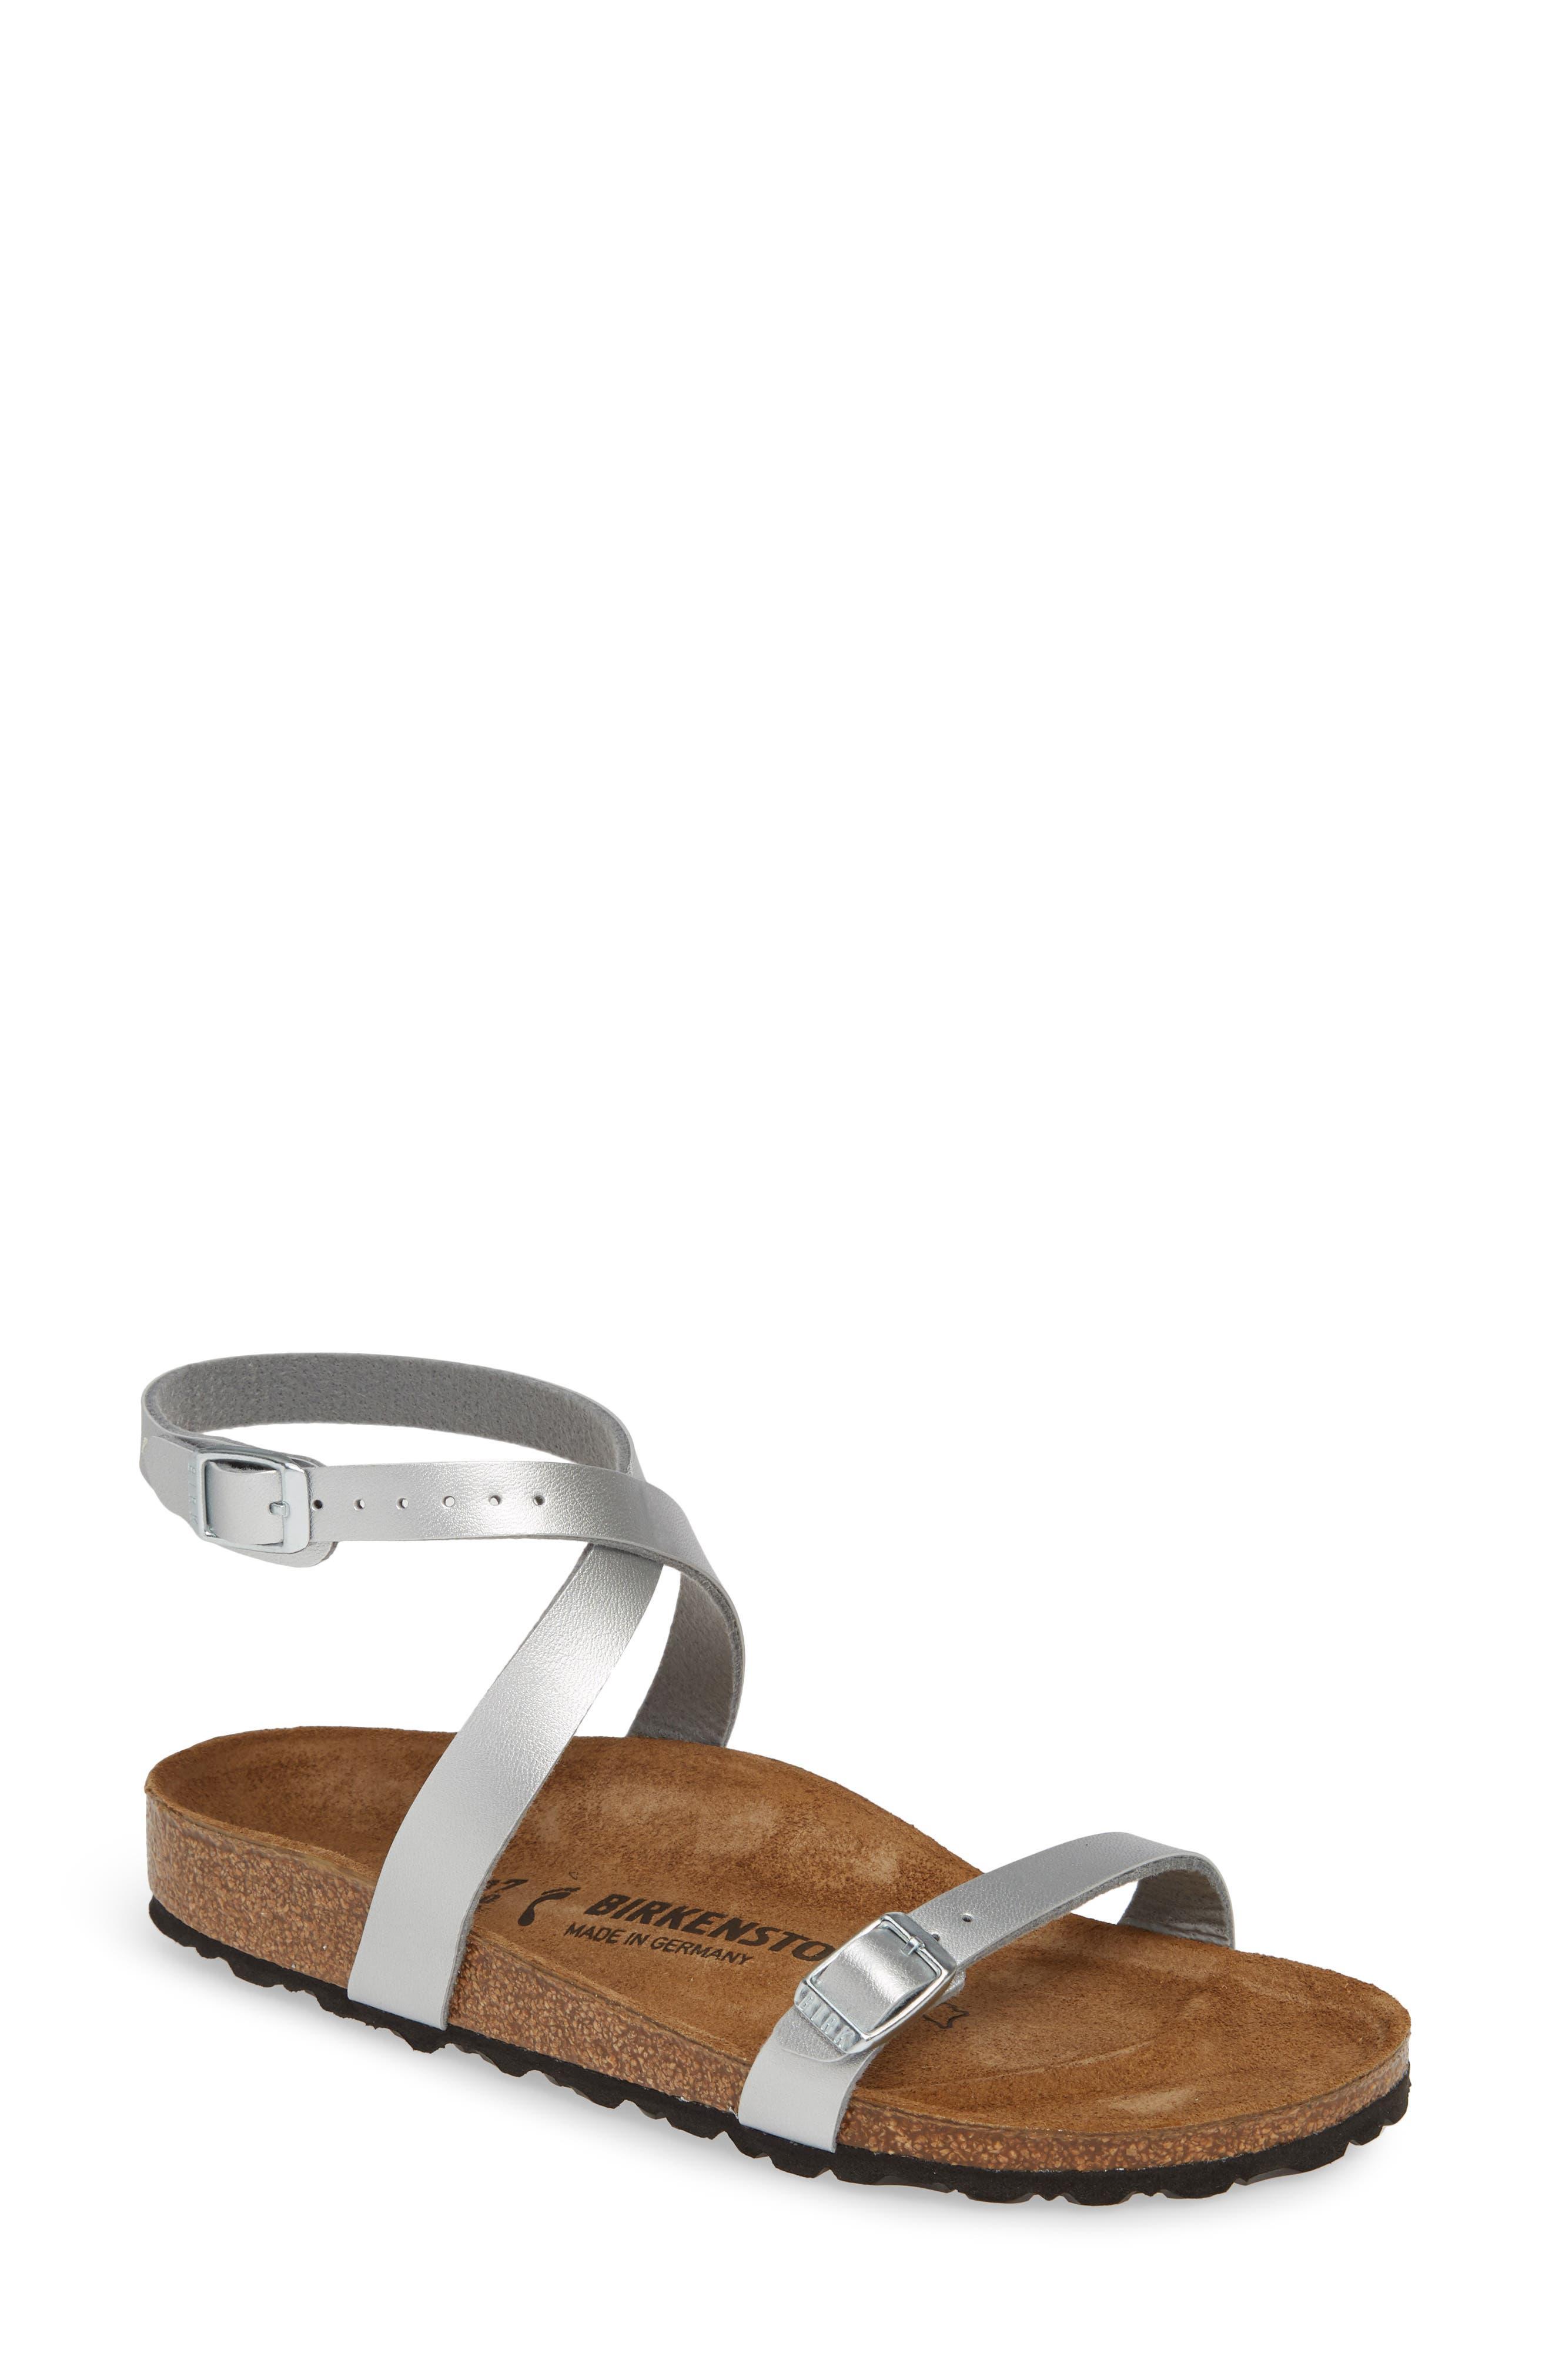 Birkenstock Daloa Ankle Strap Sandal, Metallic